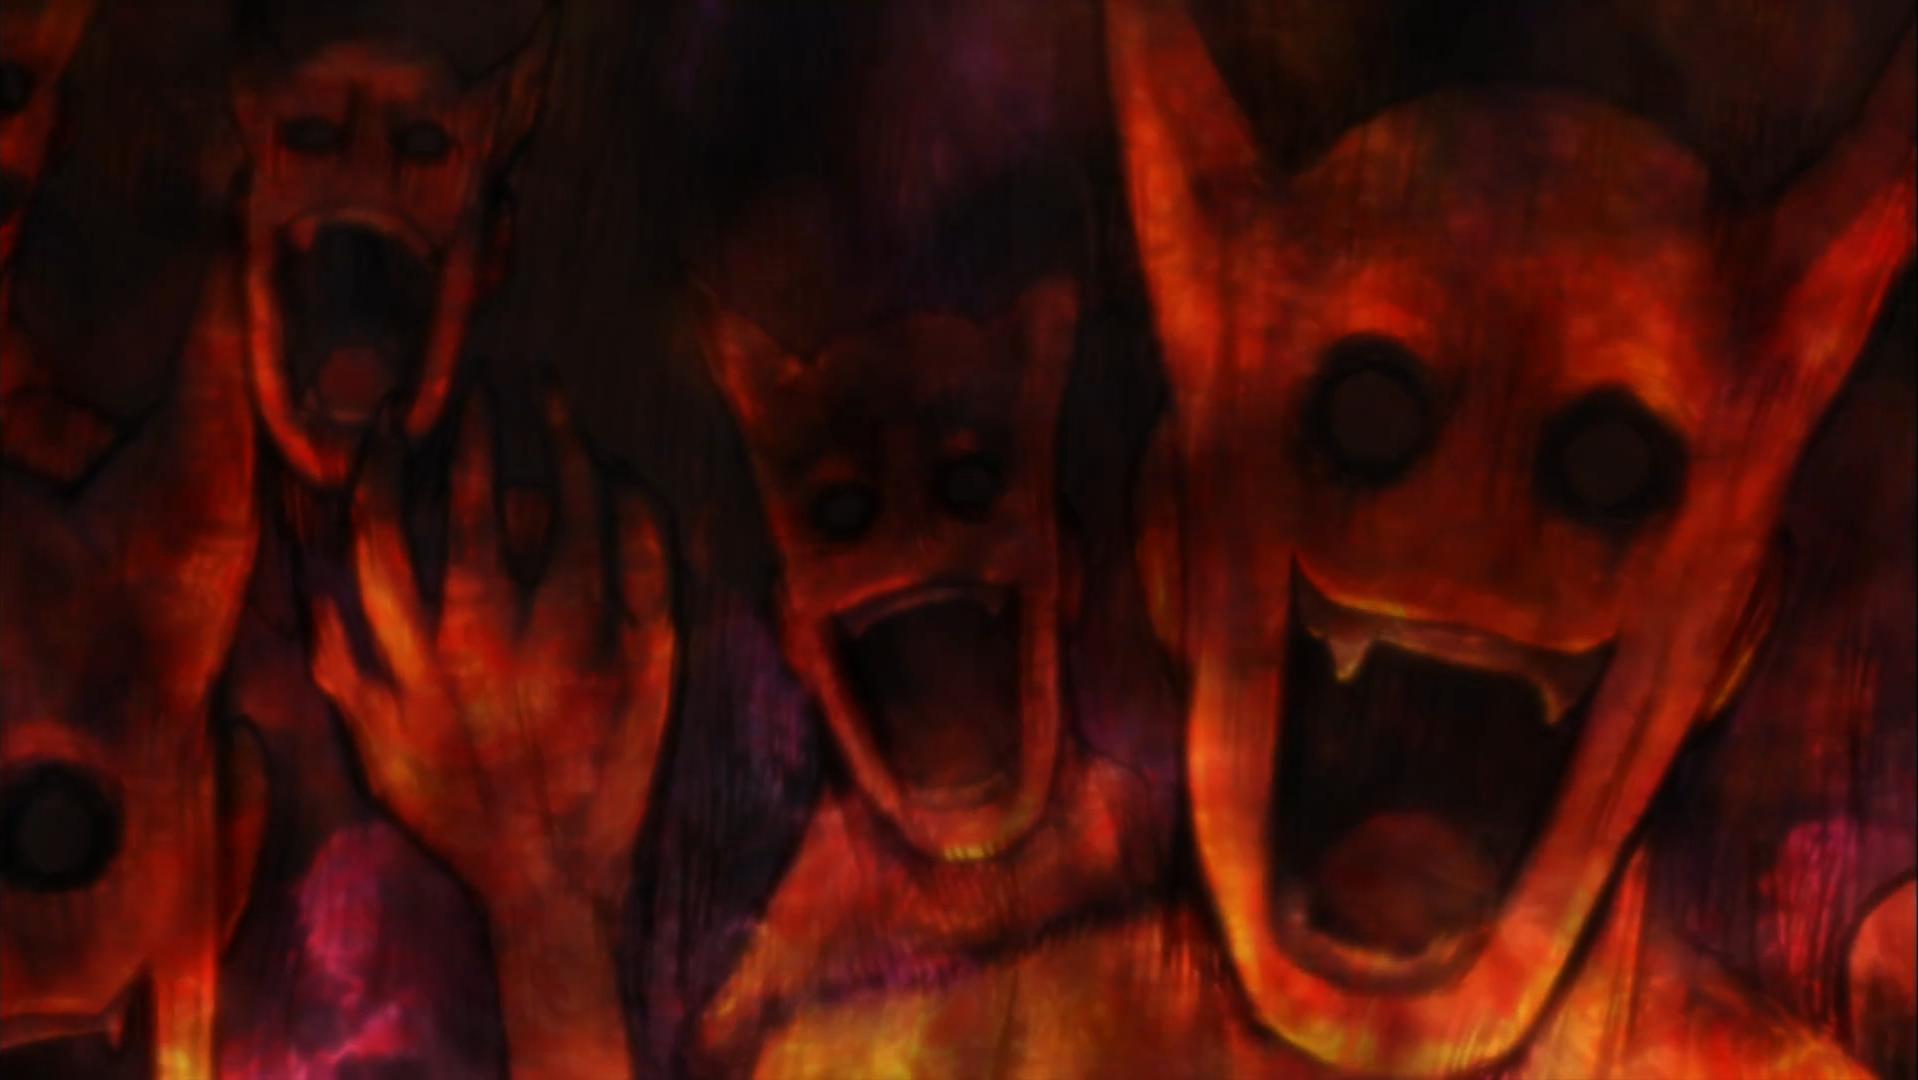 Sensujin - Demons of the forest(WIP) Jugo_no_Ichizoku